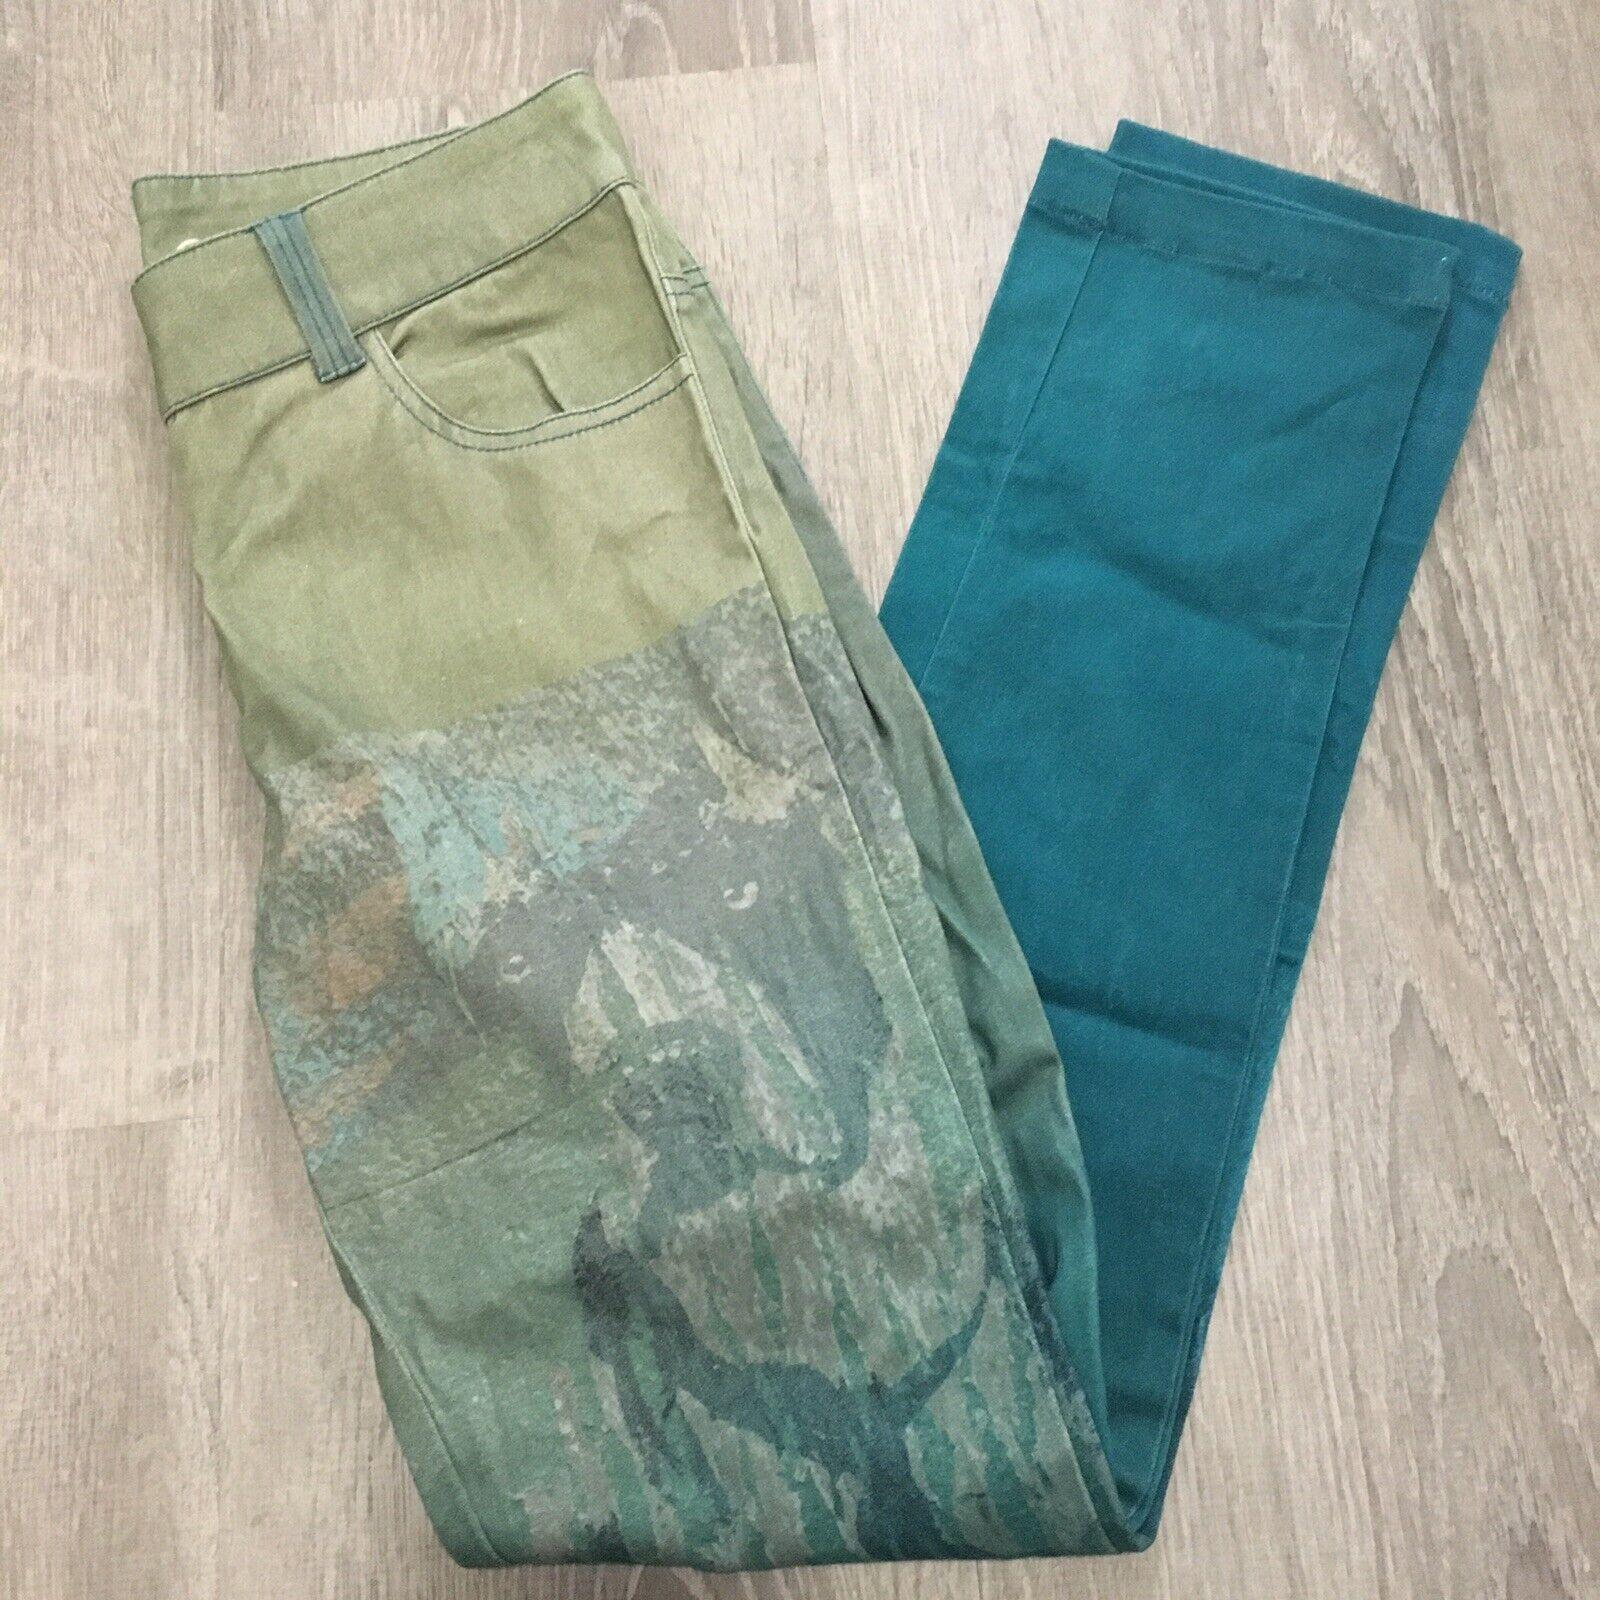 YHOSS Womens Pants Sz 6 Eu 36 Dog Image bluee Ombre Skinny Leg New Km40